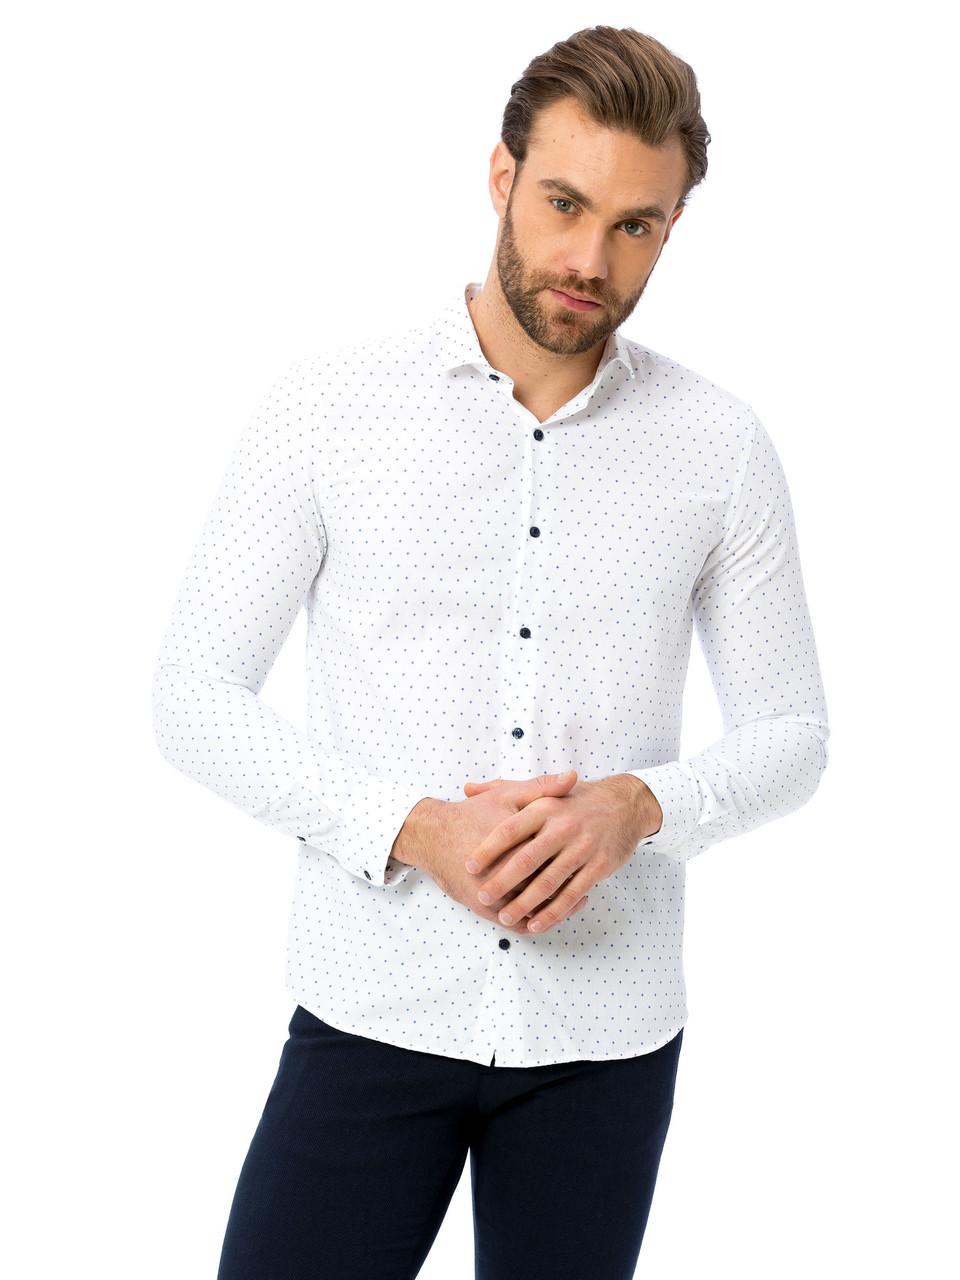 Белая мужская рубашка LC Waikiki / ЛС Вайкики в синие ромбы